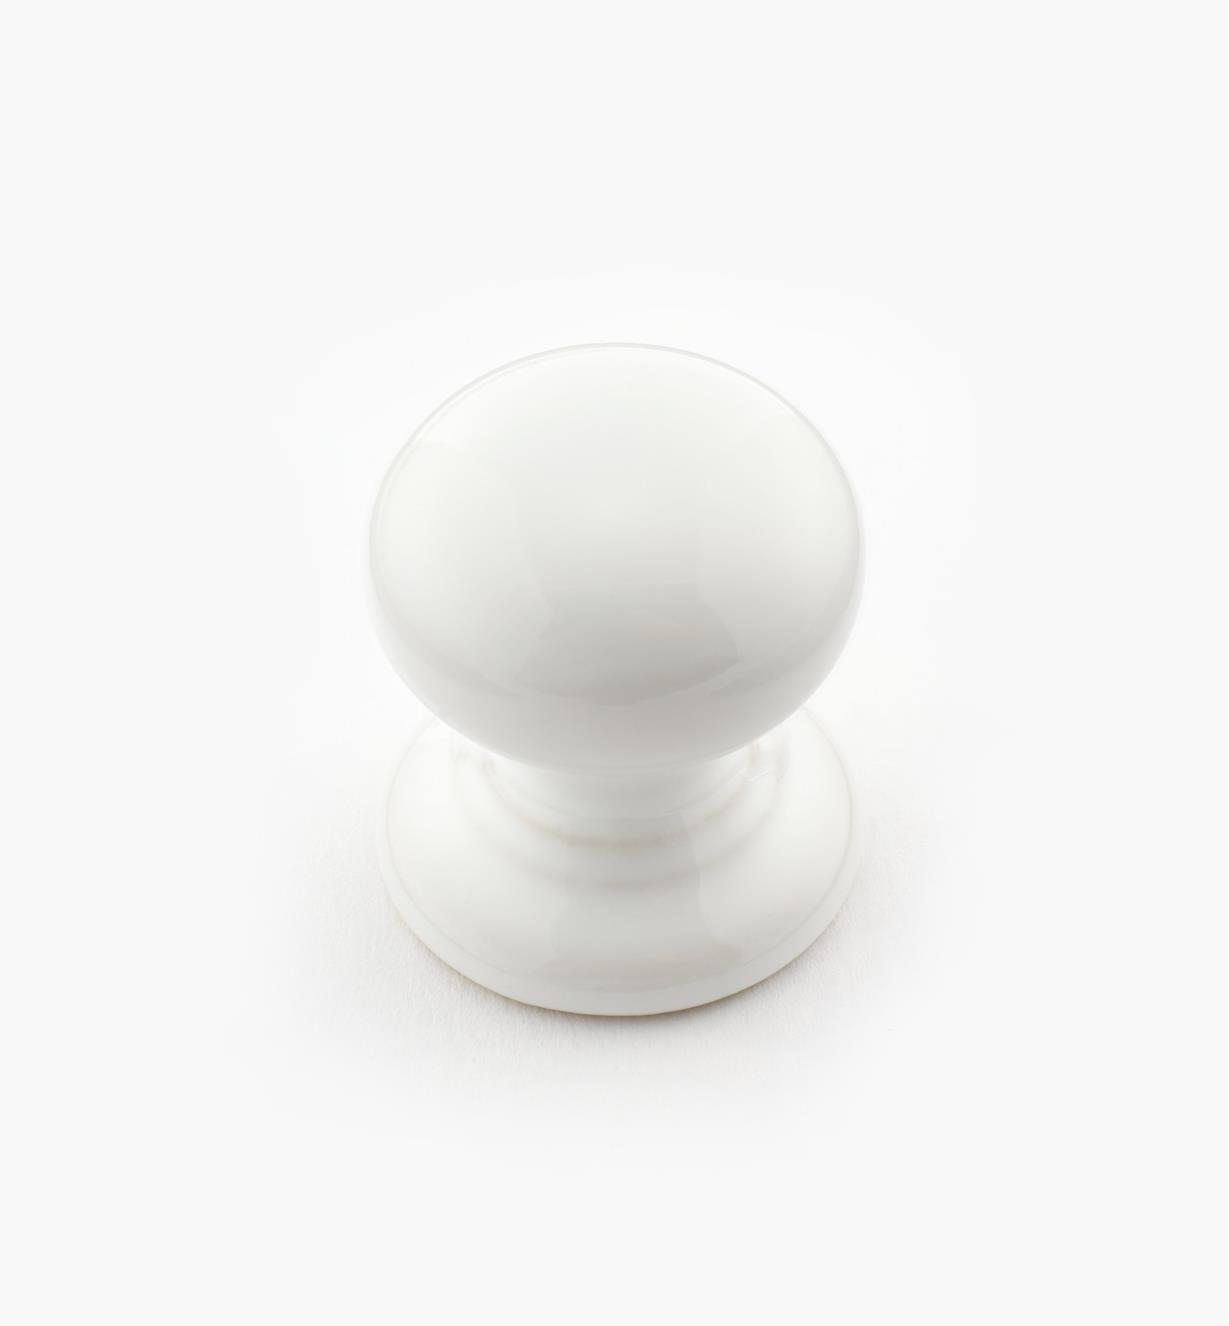 "00W4430 - 1 3/16"" x 1 1/4"" Lg Ceramic Knob"